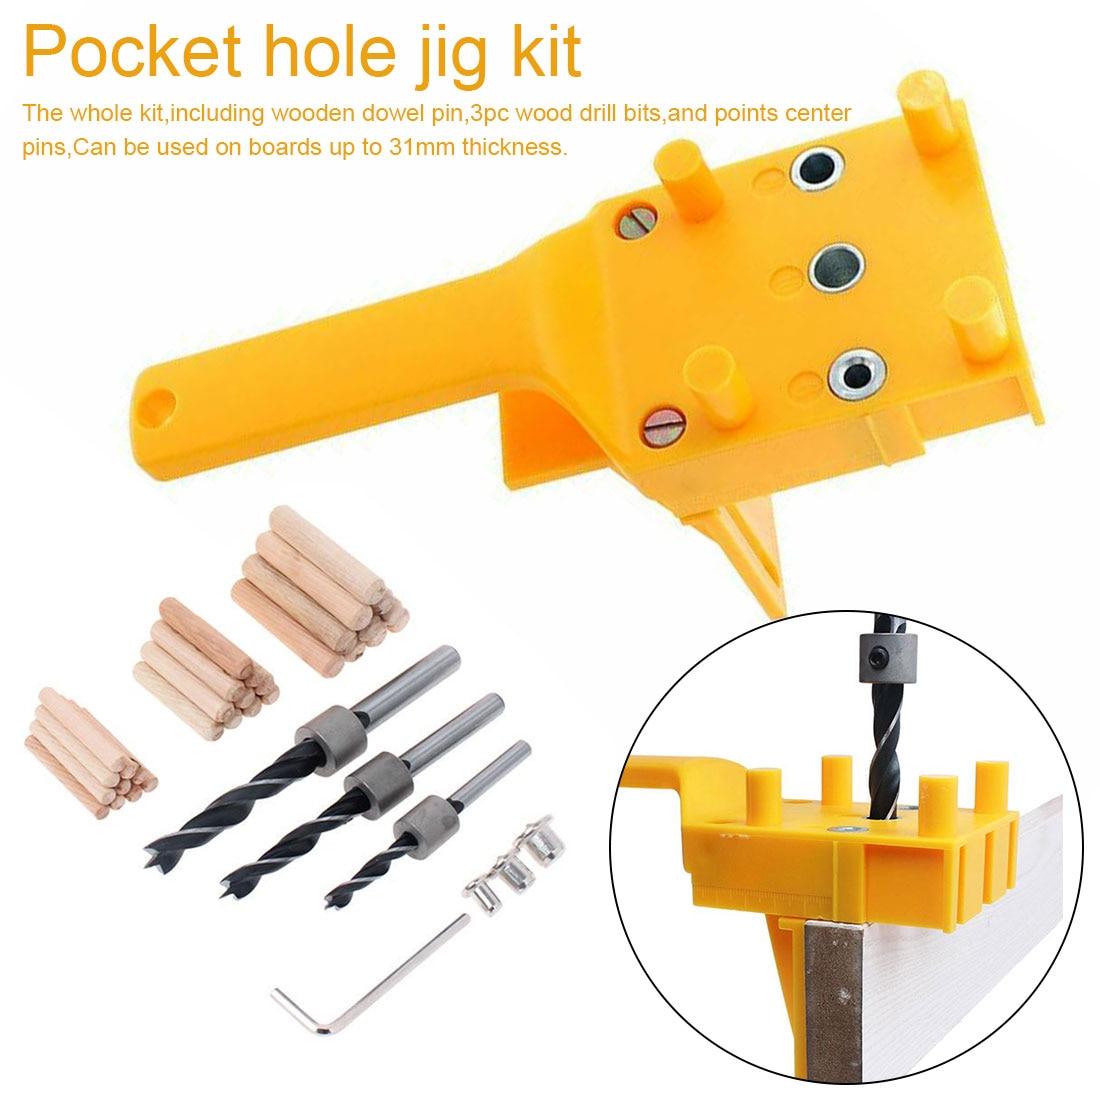 Doweling Jig 6/8/10mm Handheld Pocket Hole Jig Set Woodworking Wood Dowel Self-Centering Puncher Drill Guide Locator Jig